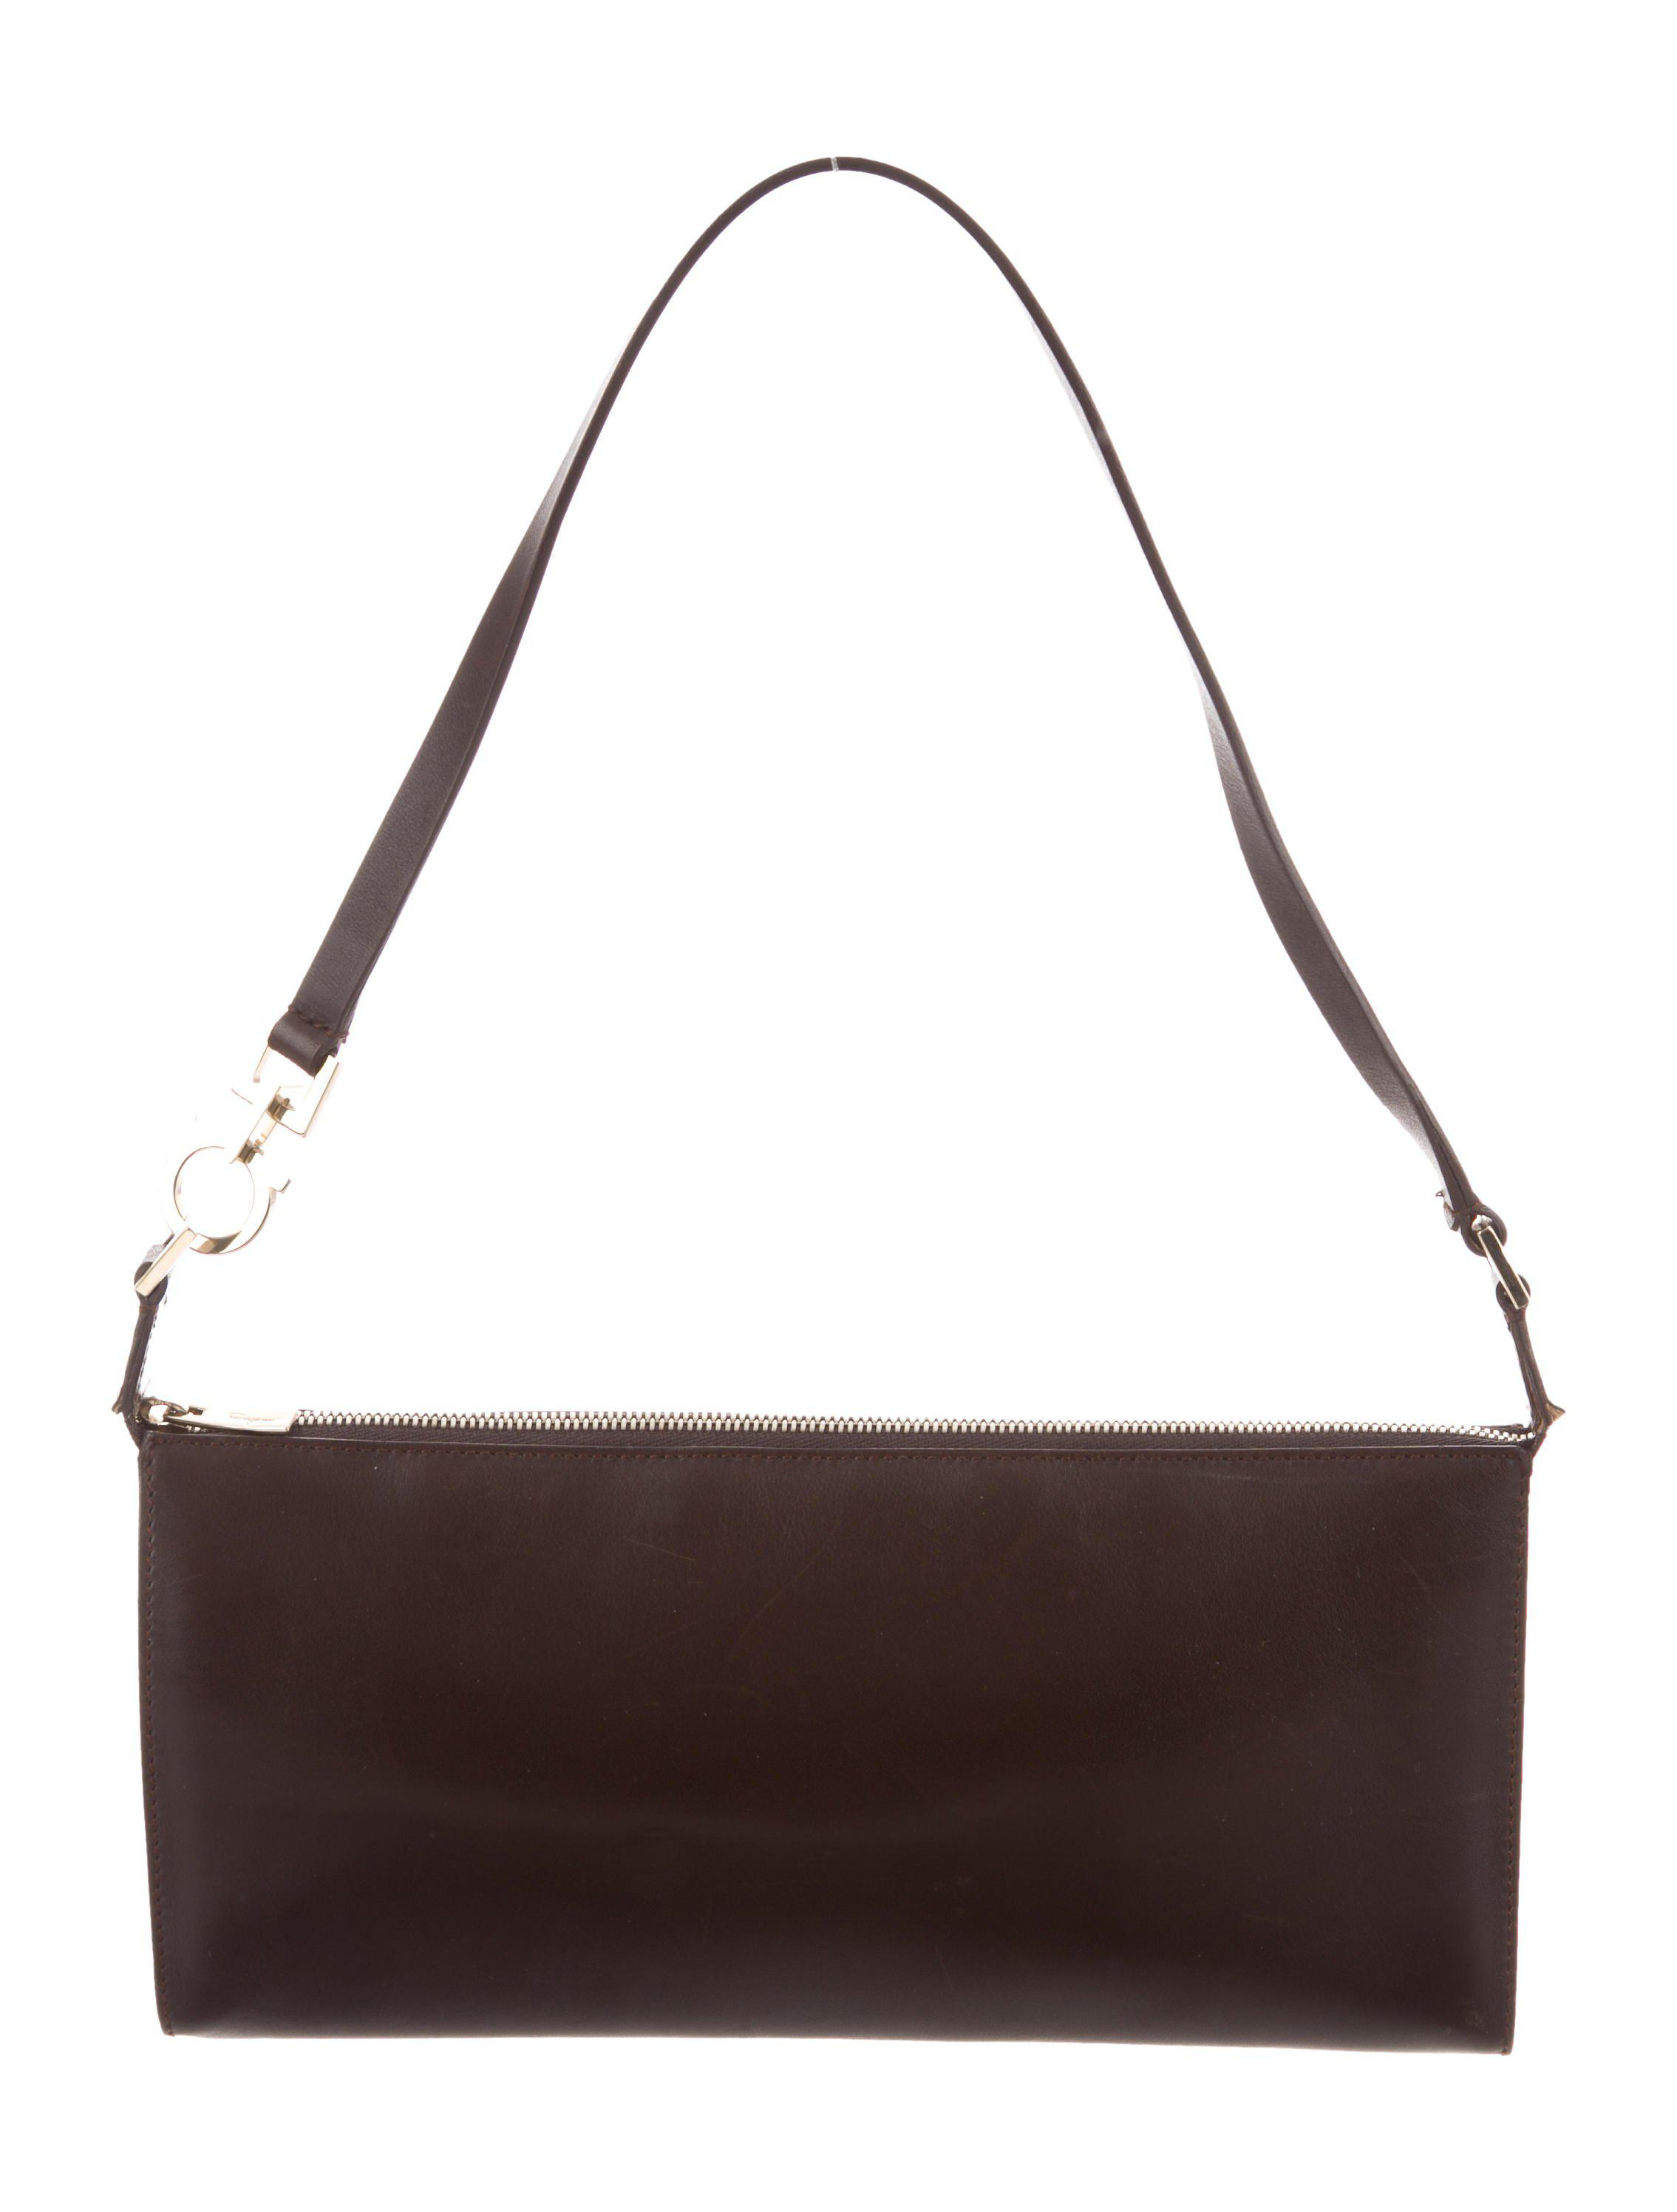 58576cb9e656 Lyst - Ferragamo Leather Shoulder Bag Brown in Metallic